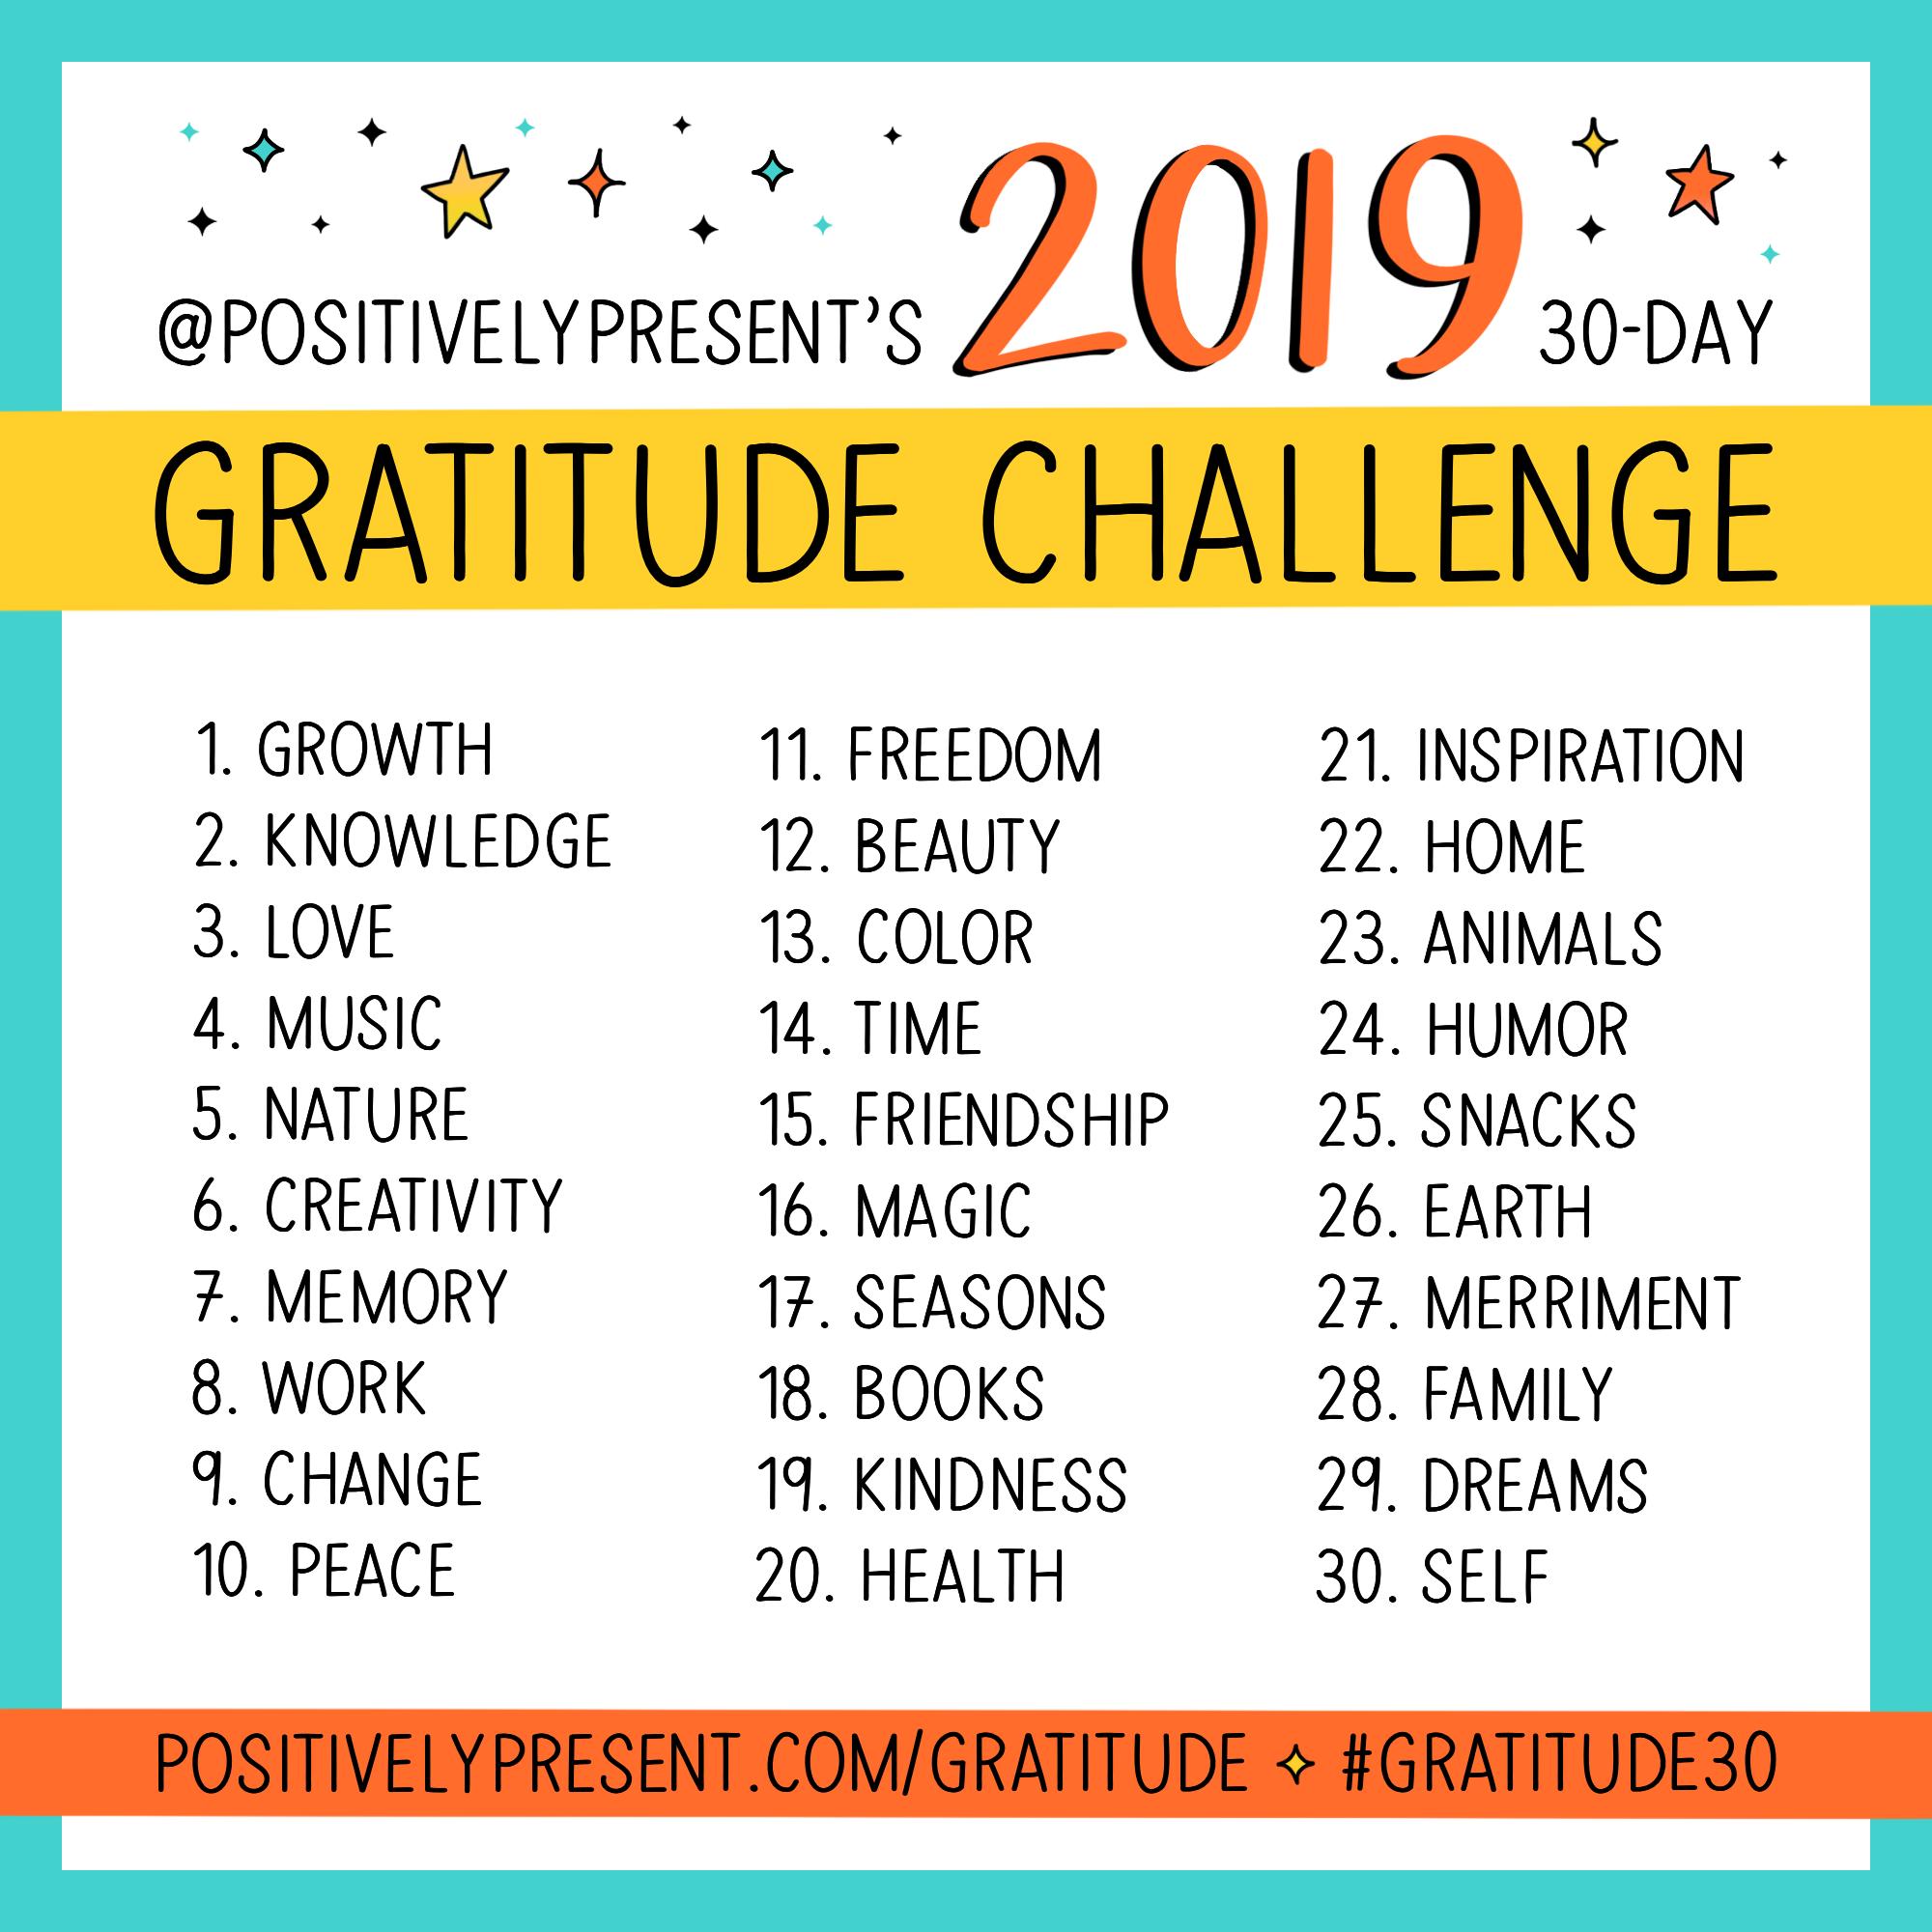 2019 gratitude challenge